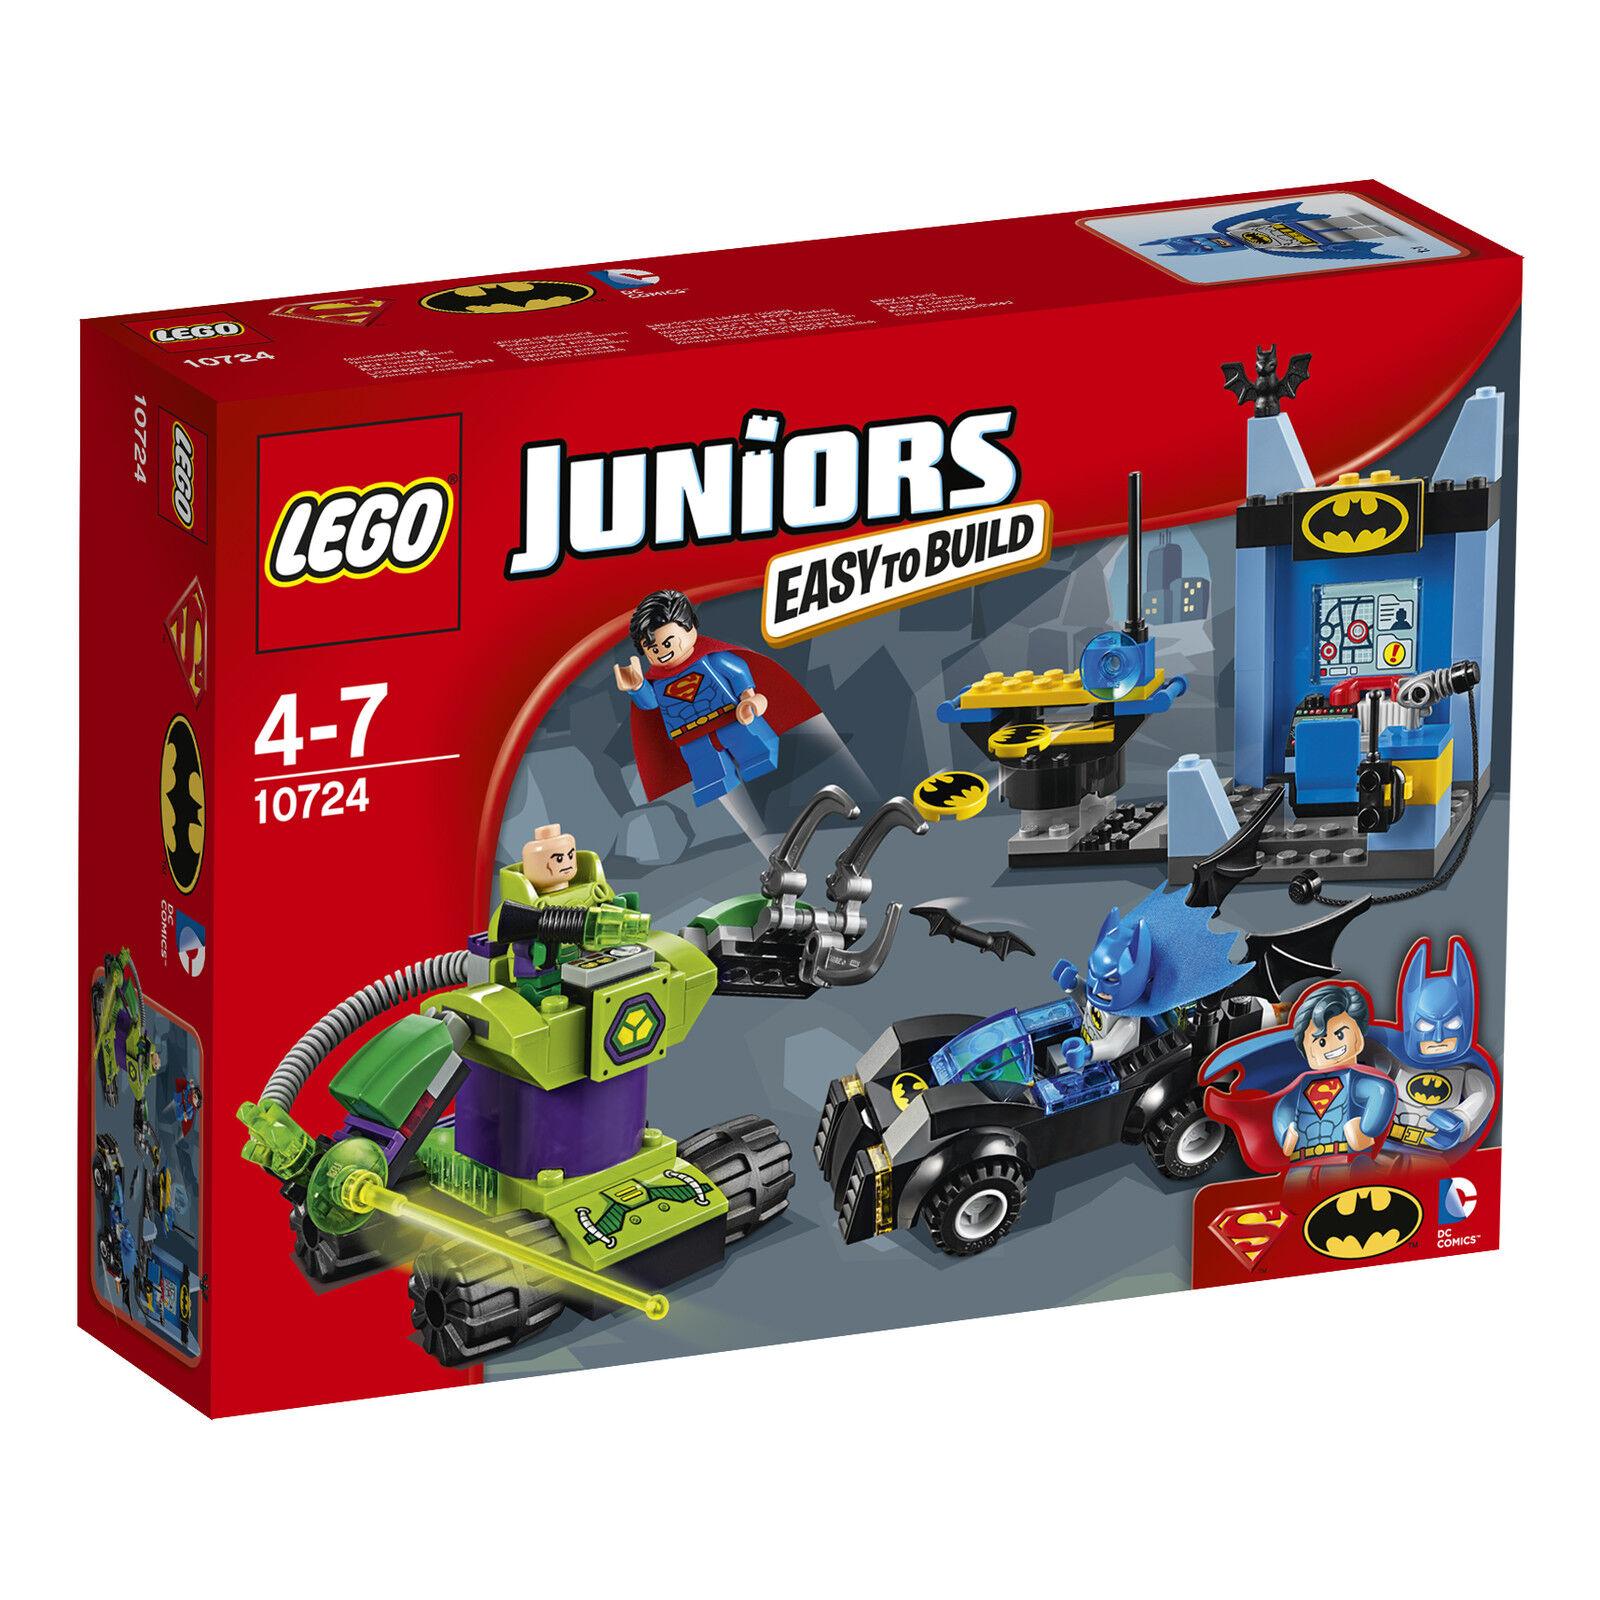 LEGO® Juniors 10724 Batman™ & Superman™ gegen Lex Luthor™ NEU OVP NEW MISB NRFB  | Exquisite (in) Verarbeitung